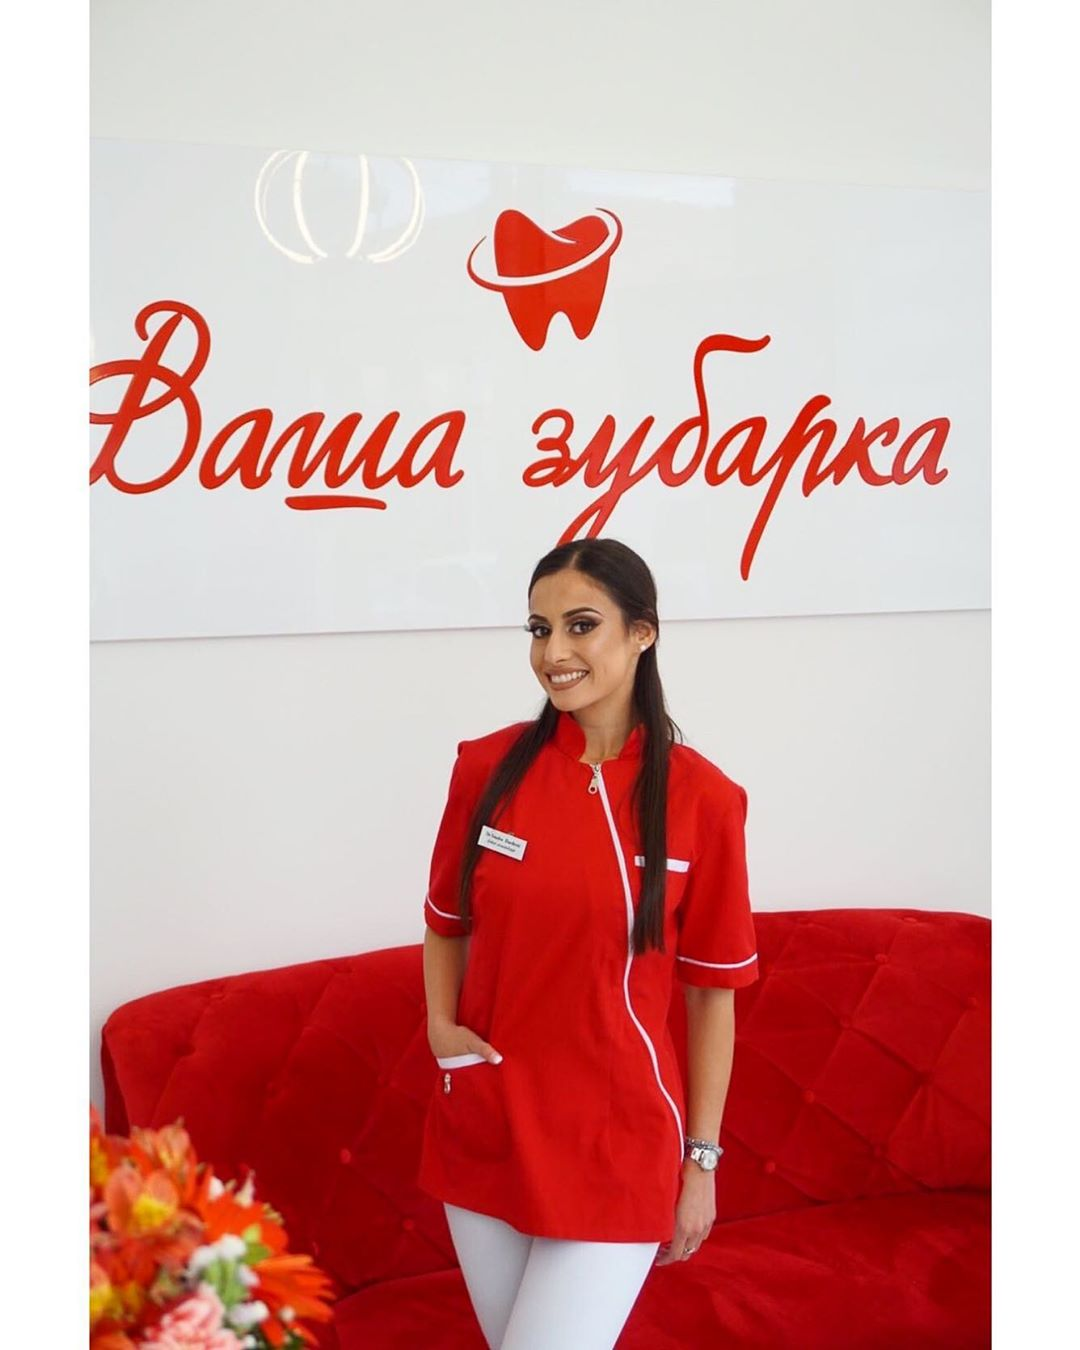 dr Sandra Djurdjevic